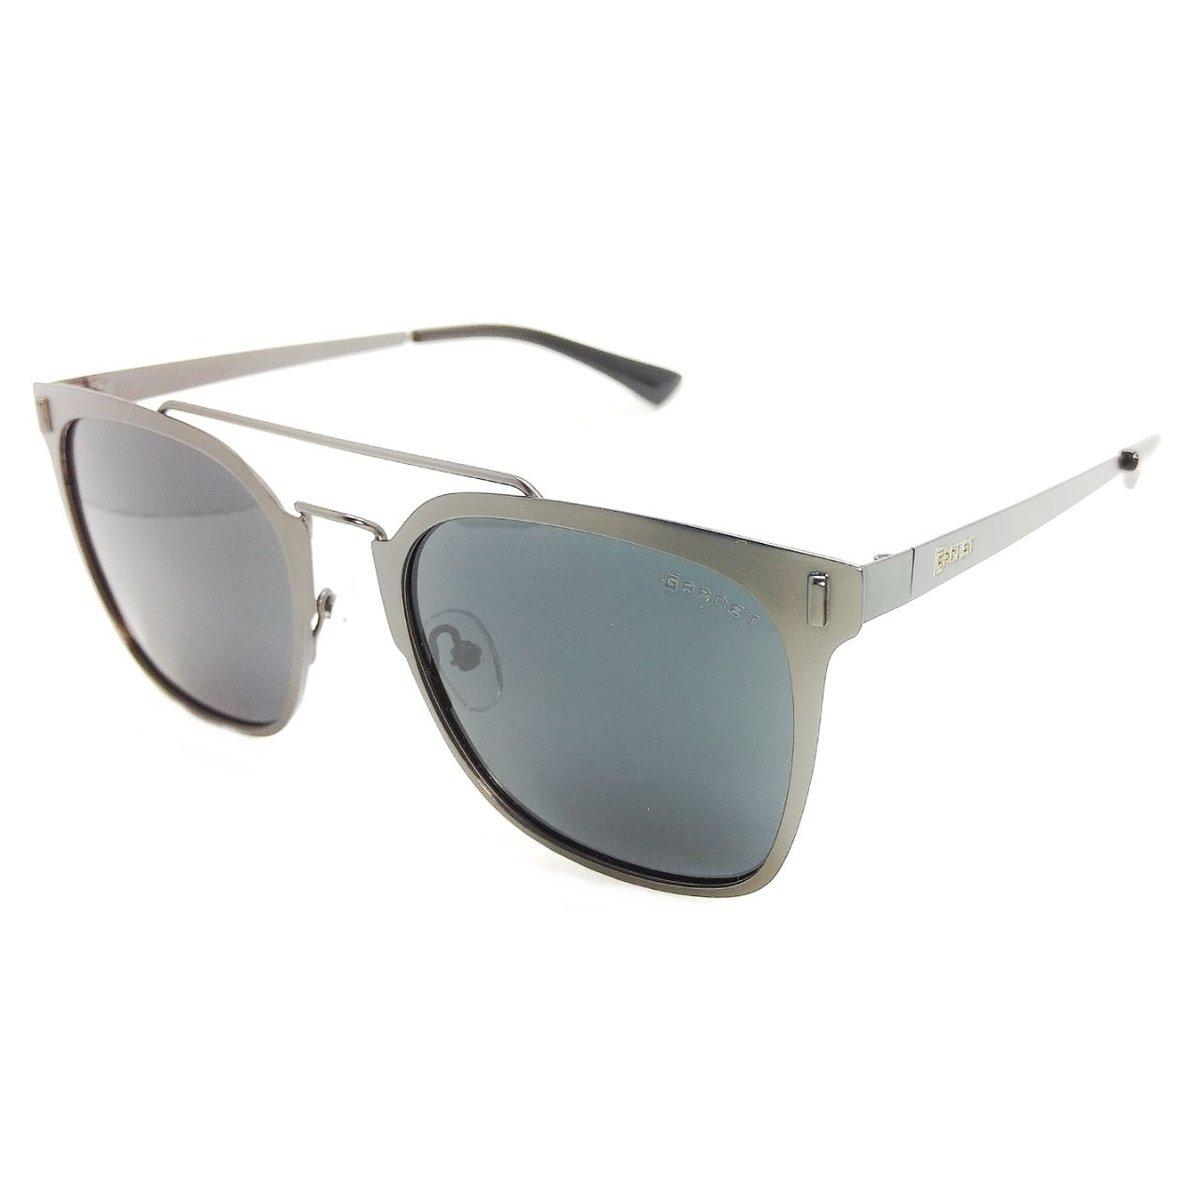 Óculos De Sol Classic Garnet Original - Compre Agora   Zattini a44d957032